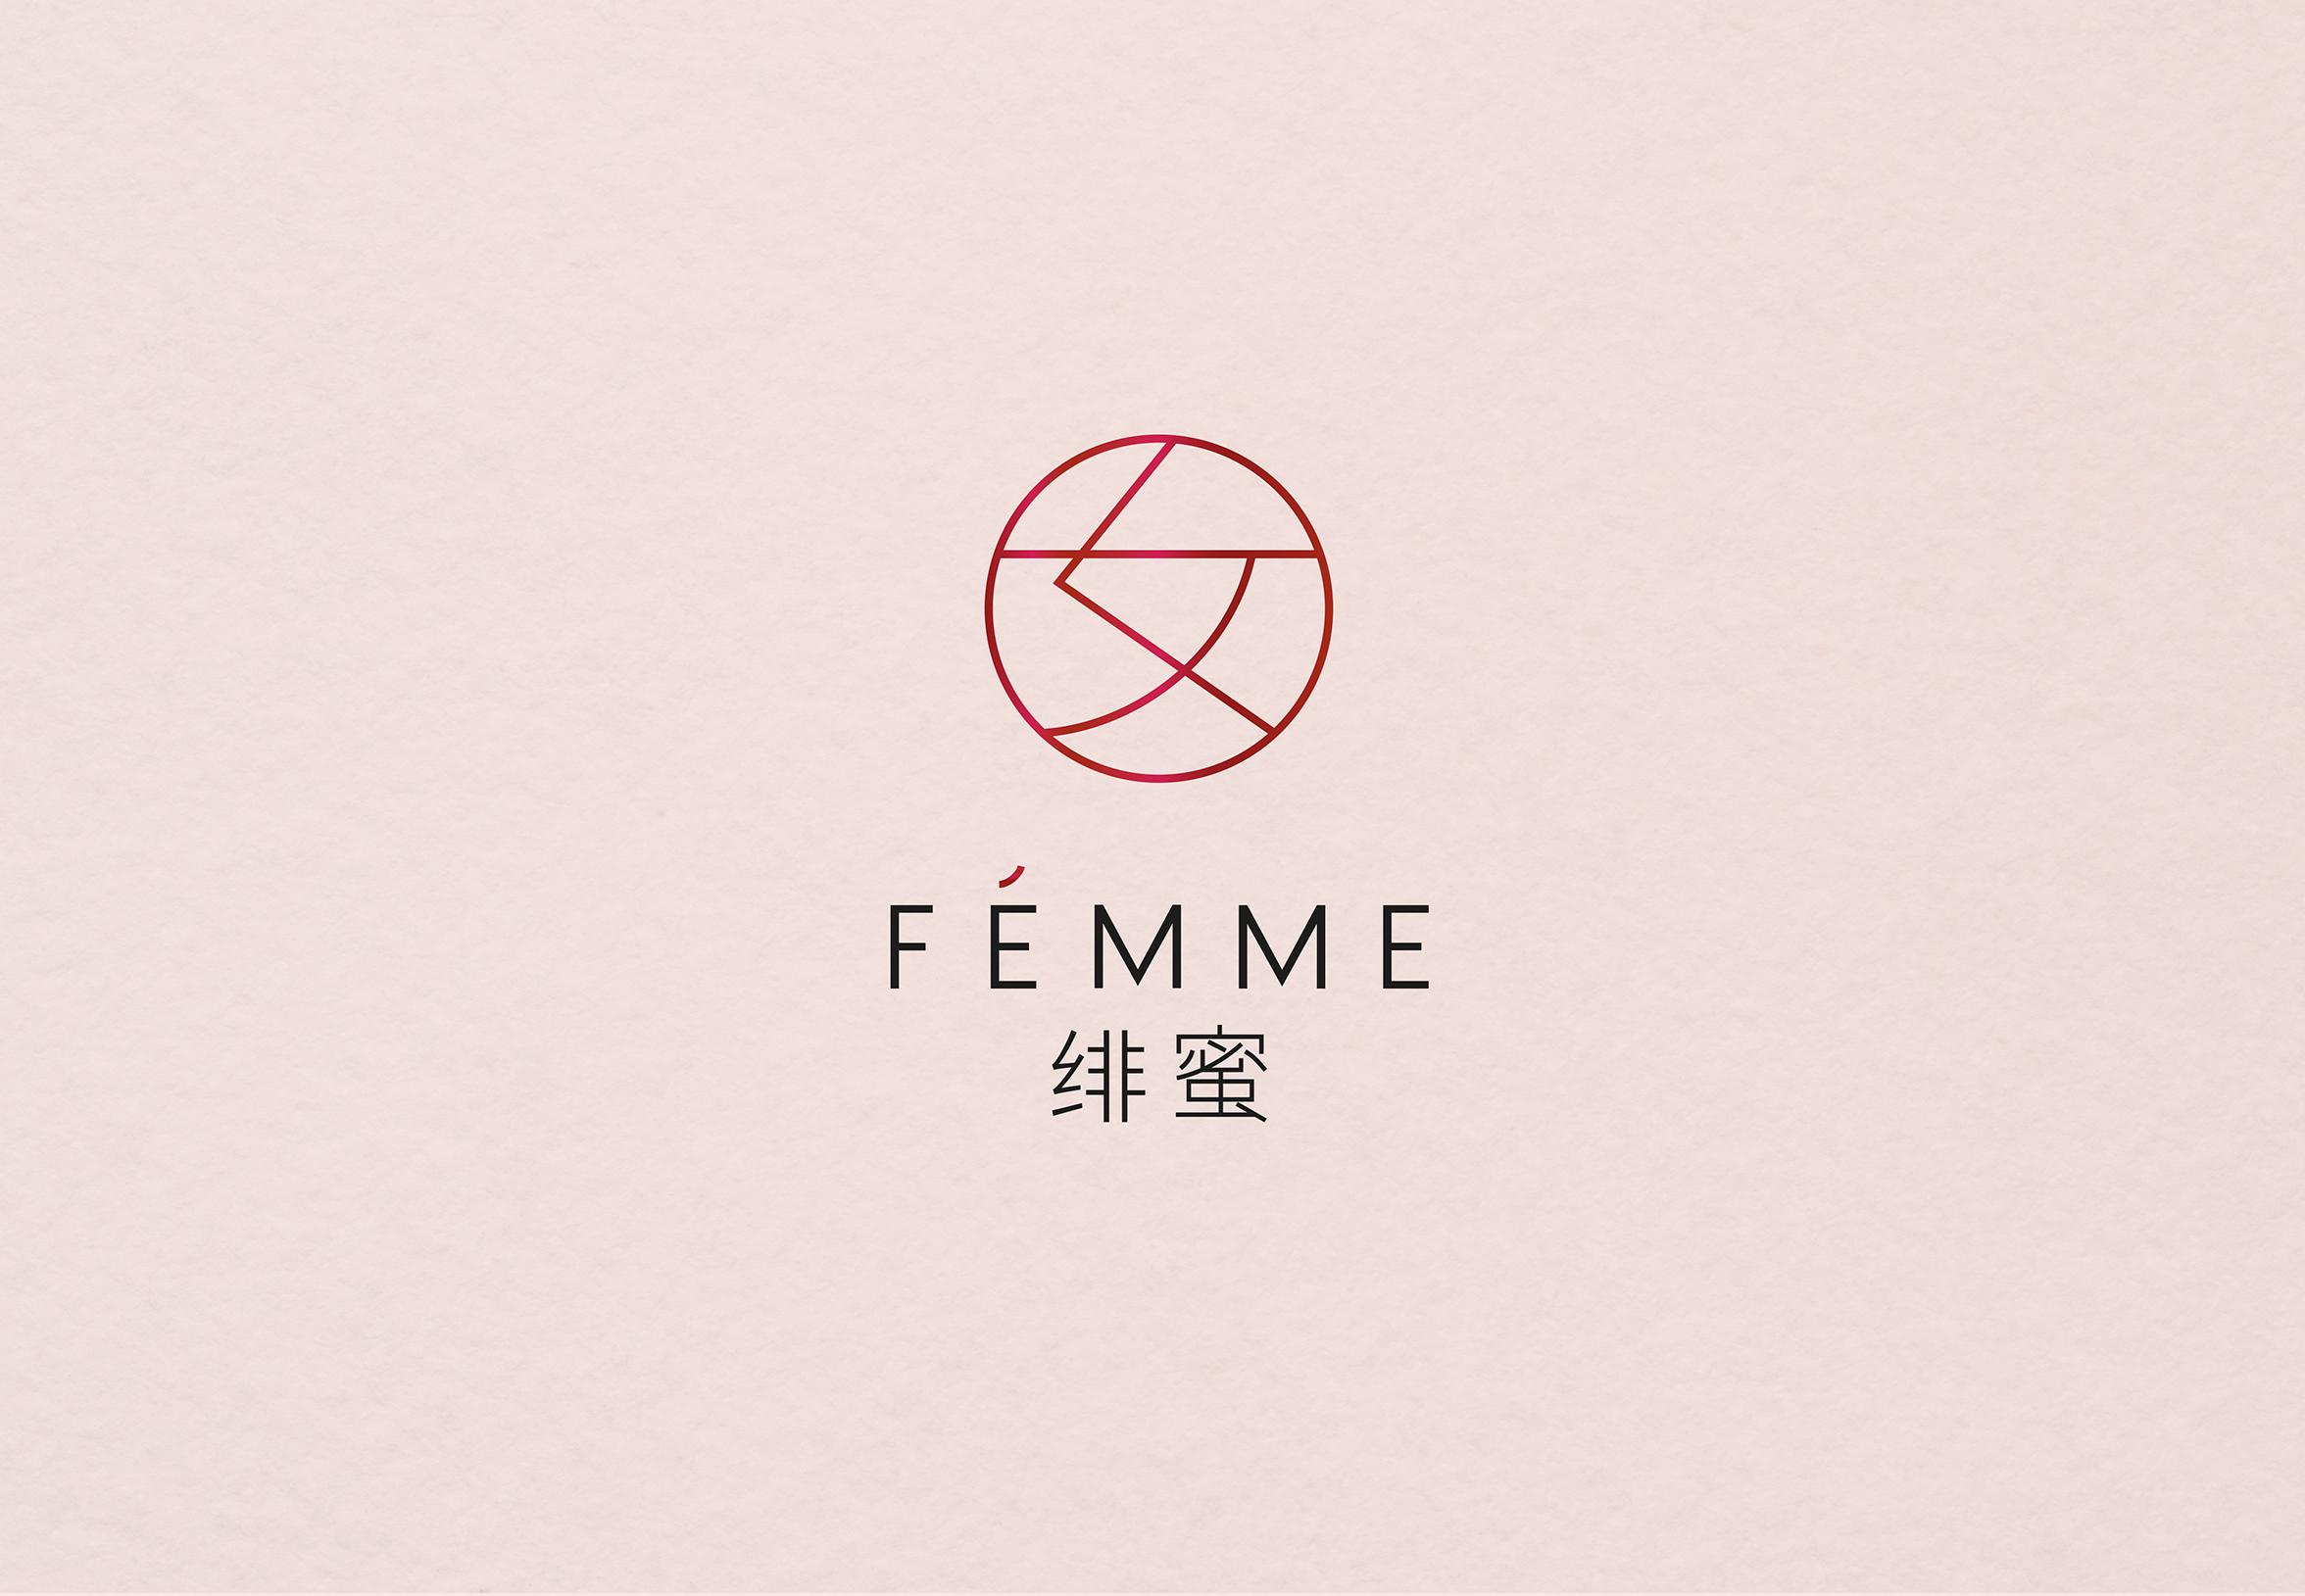 Femme_05